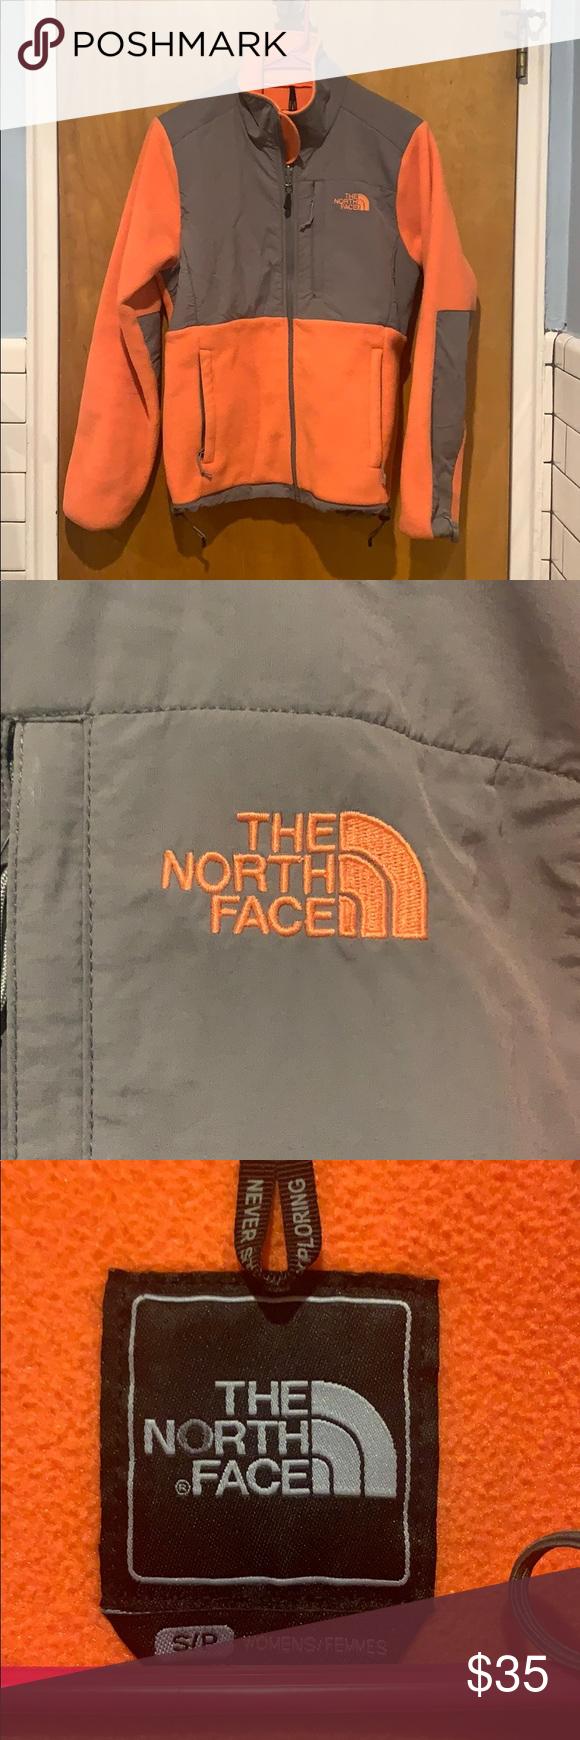 North Face Orange Fleece Jacket In 2020 Orange Fleece Jacket Fleece Jacket Orange Fleece [ 1740 x 580 Pixel ]